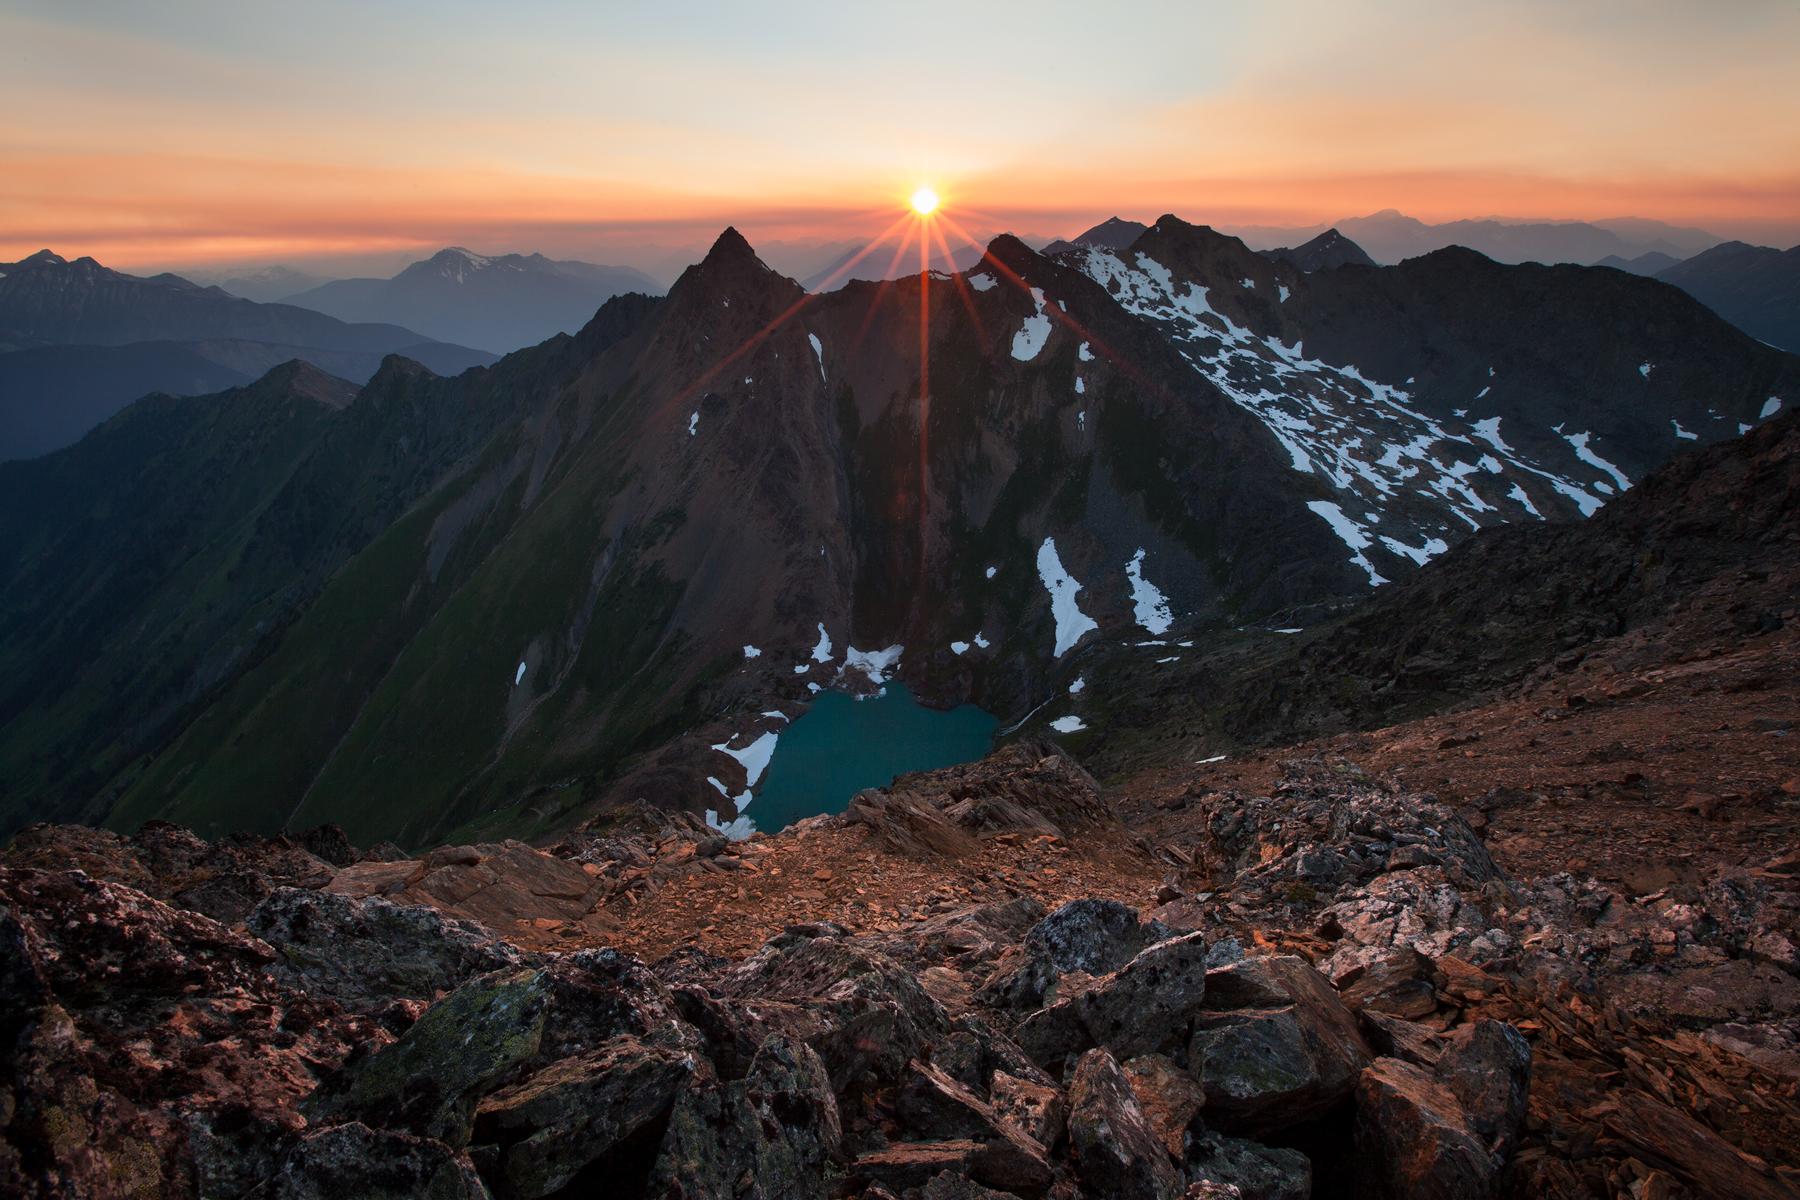 The sun sets over Crystal Peak near D'Arcy, B.C, Canada.  Image ©Connor Stefanison